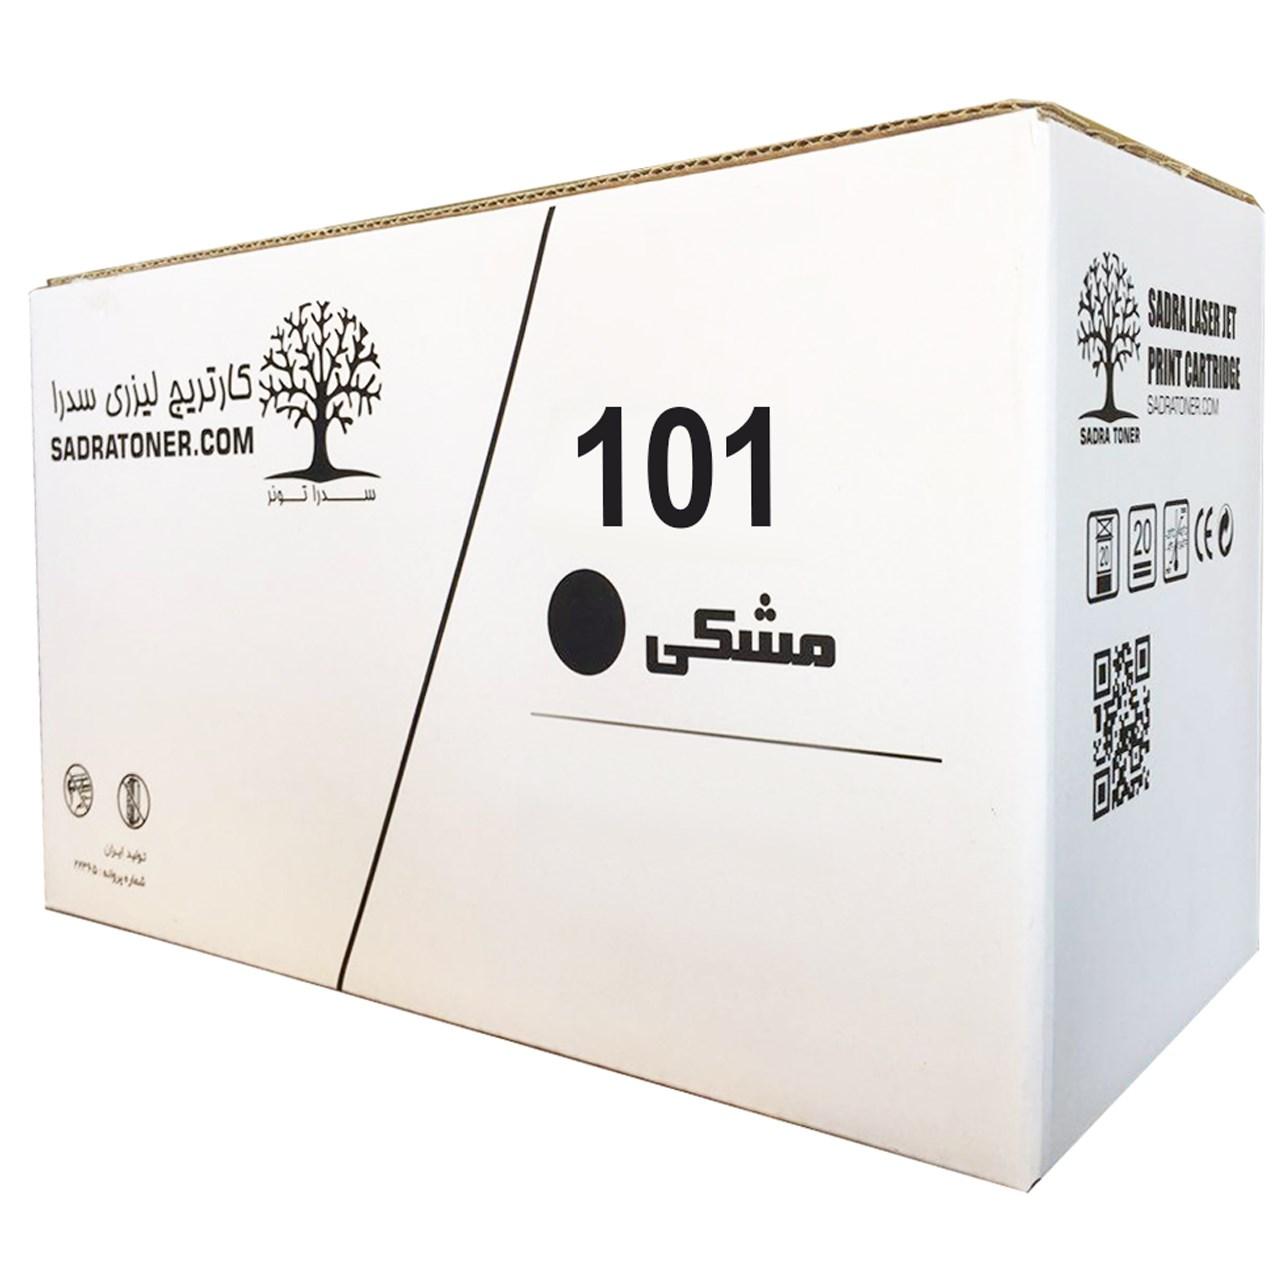 قیمت                      تونر مشکی سدرا مدل 101